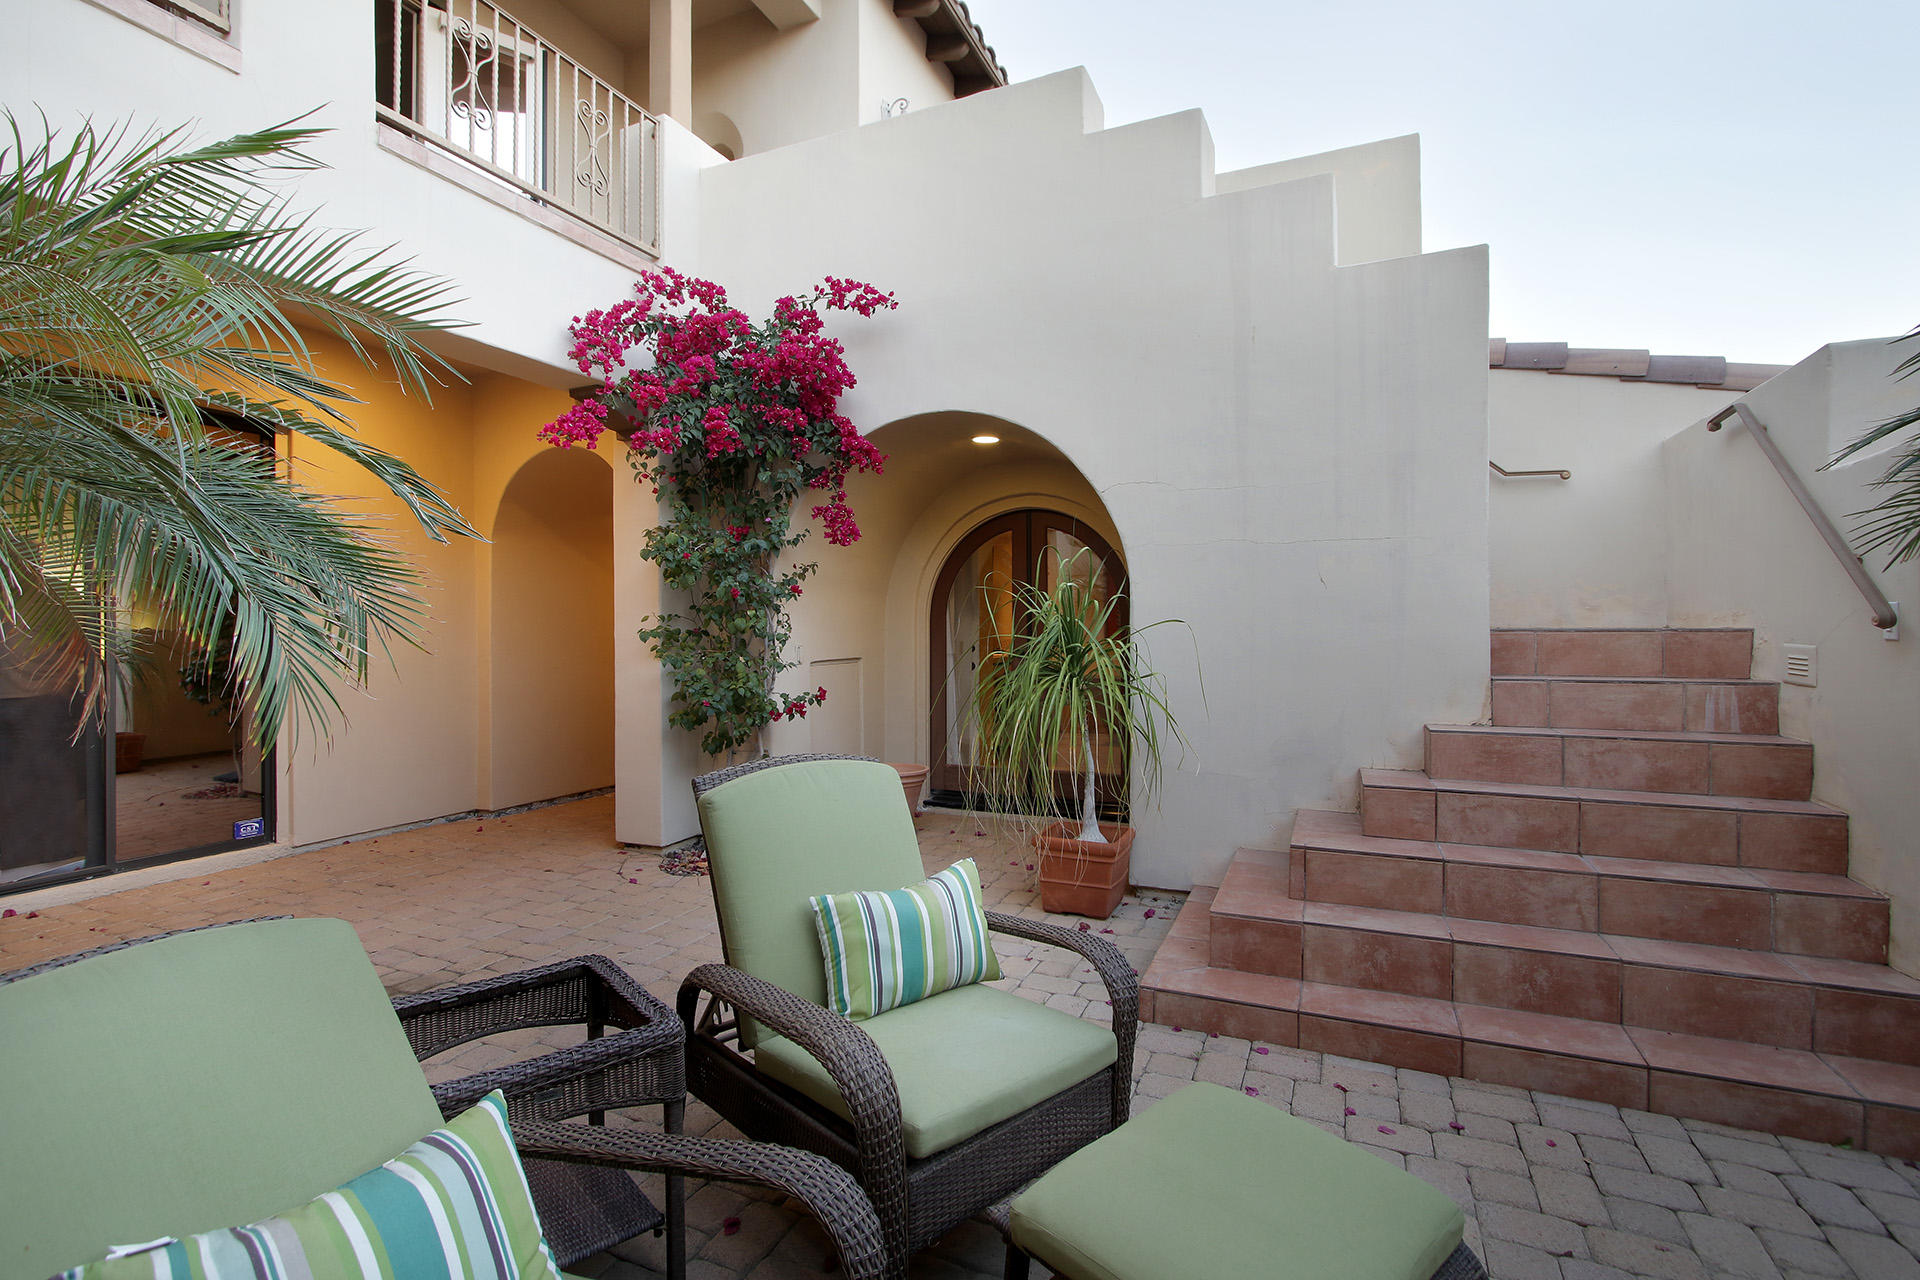 80701 Via Glorieta, La Quinta, California 92253, 3 Bedrooms Bedrooms, ,4 BathroomsBathrooms,Residential,For Sale,80701 Via Glorieta,219039686